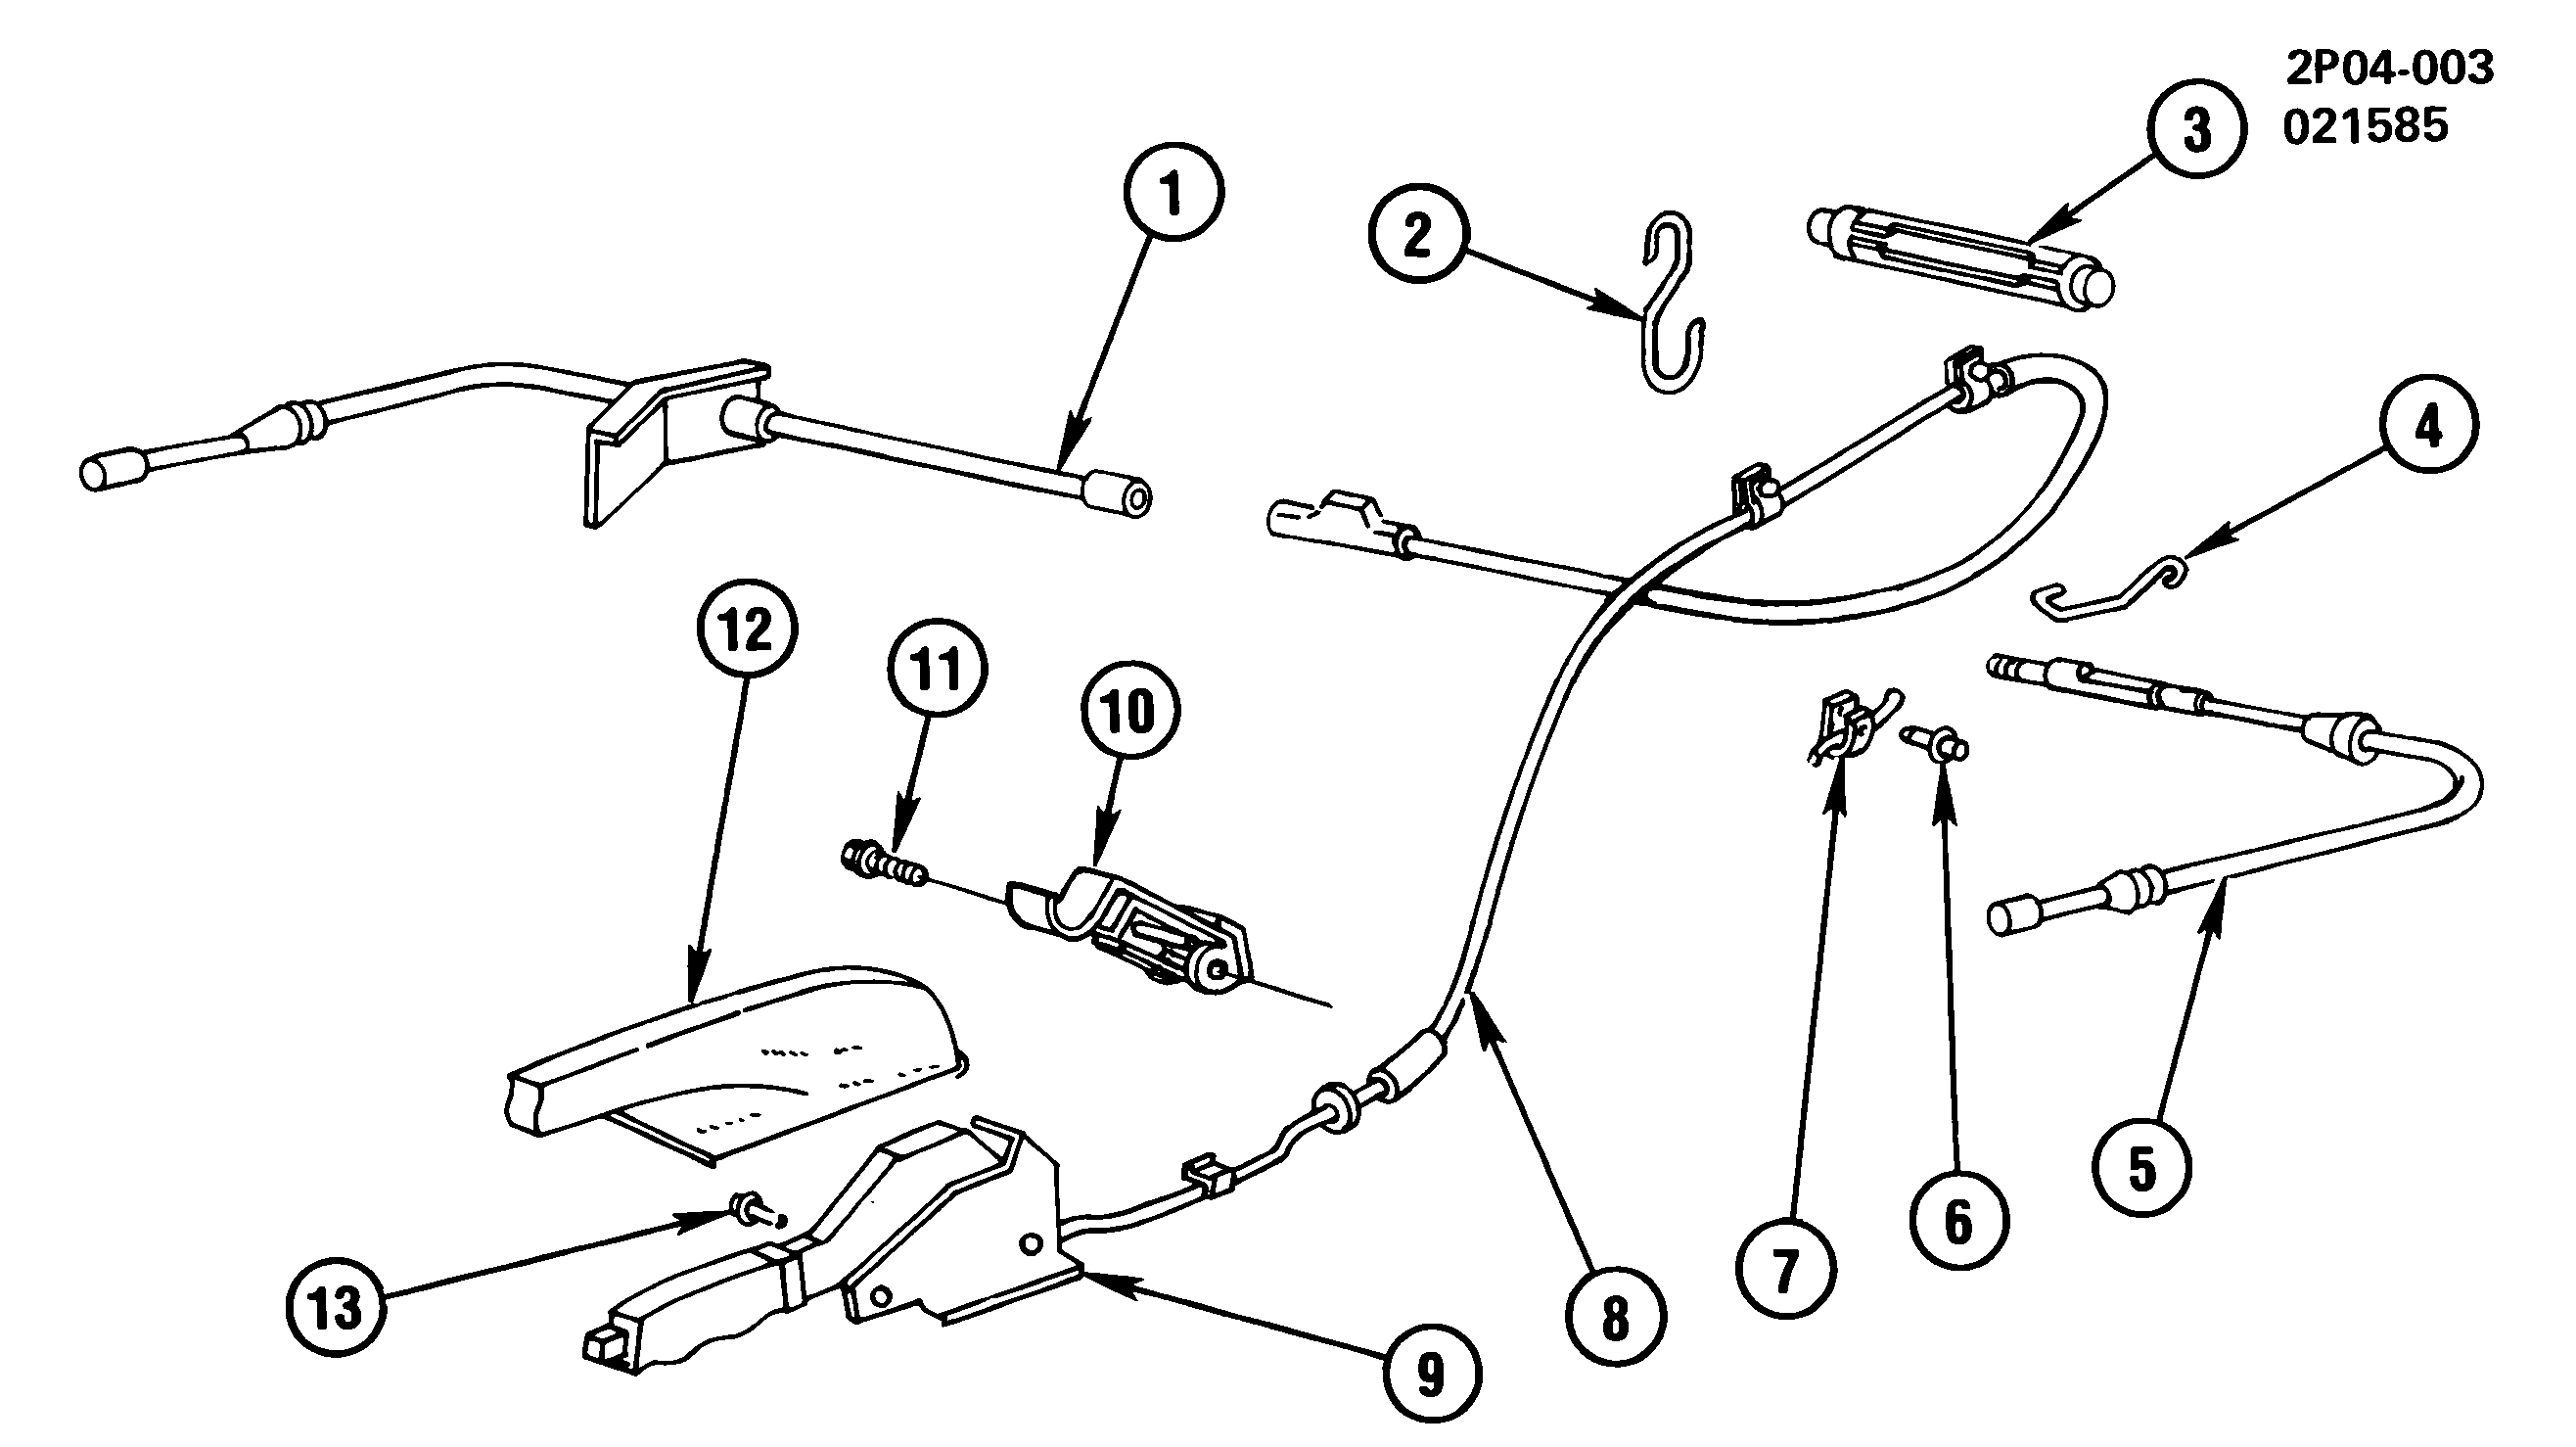 Pontiac Brakes Diagram : Pontiac fiero parts catalogs imageresizertool